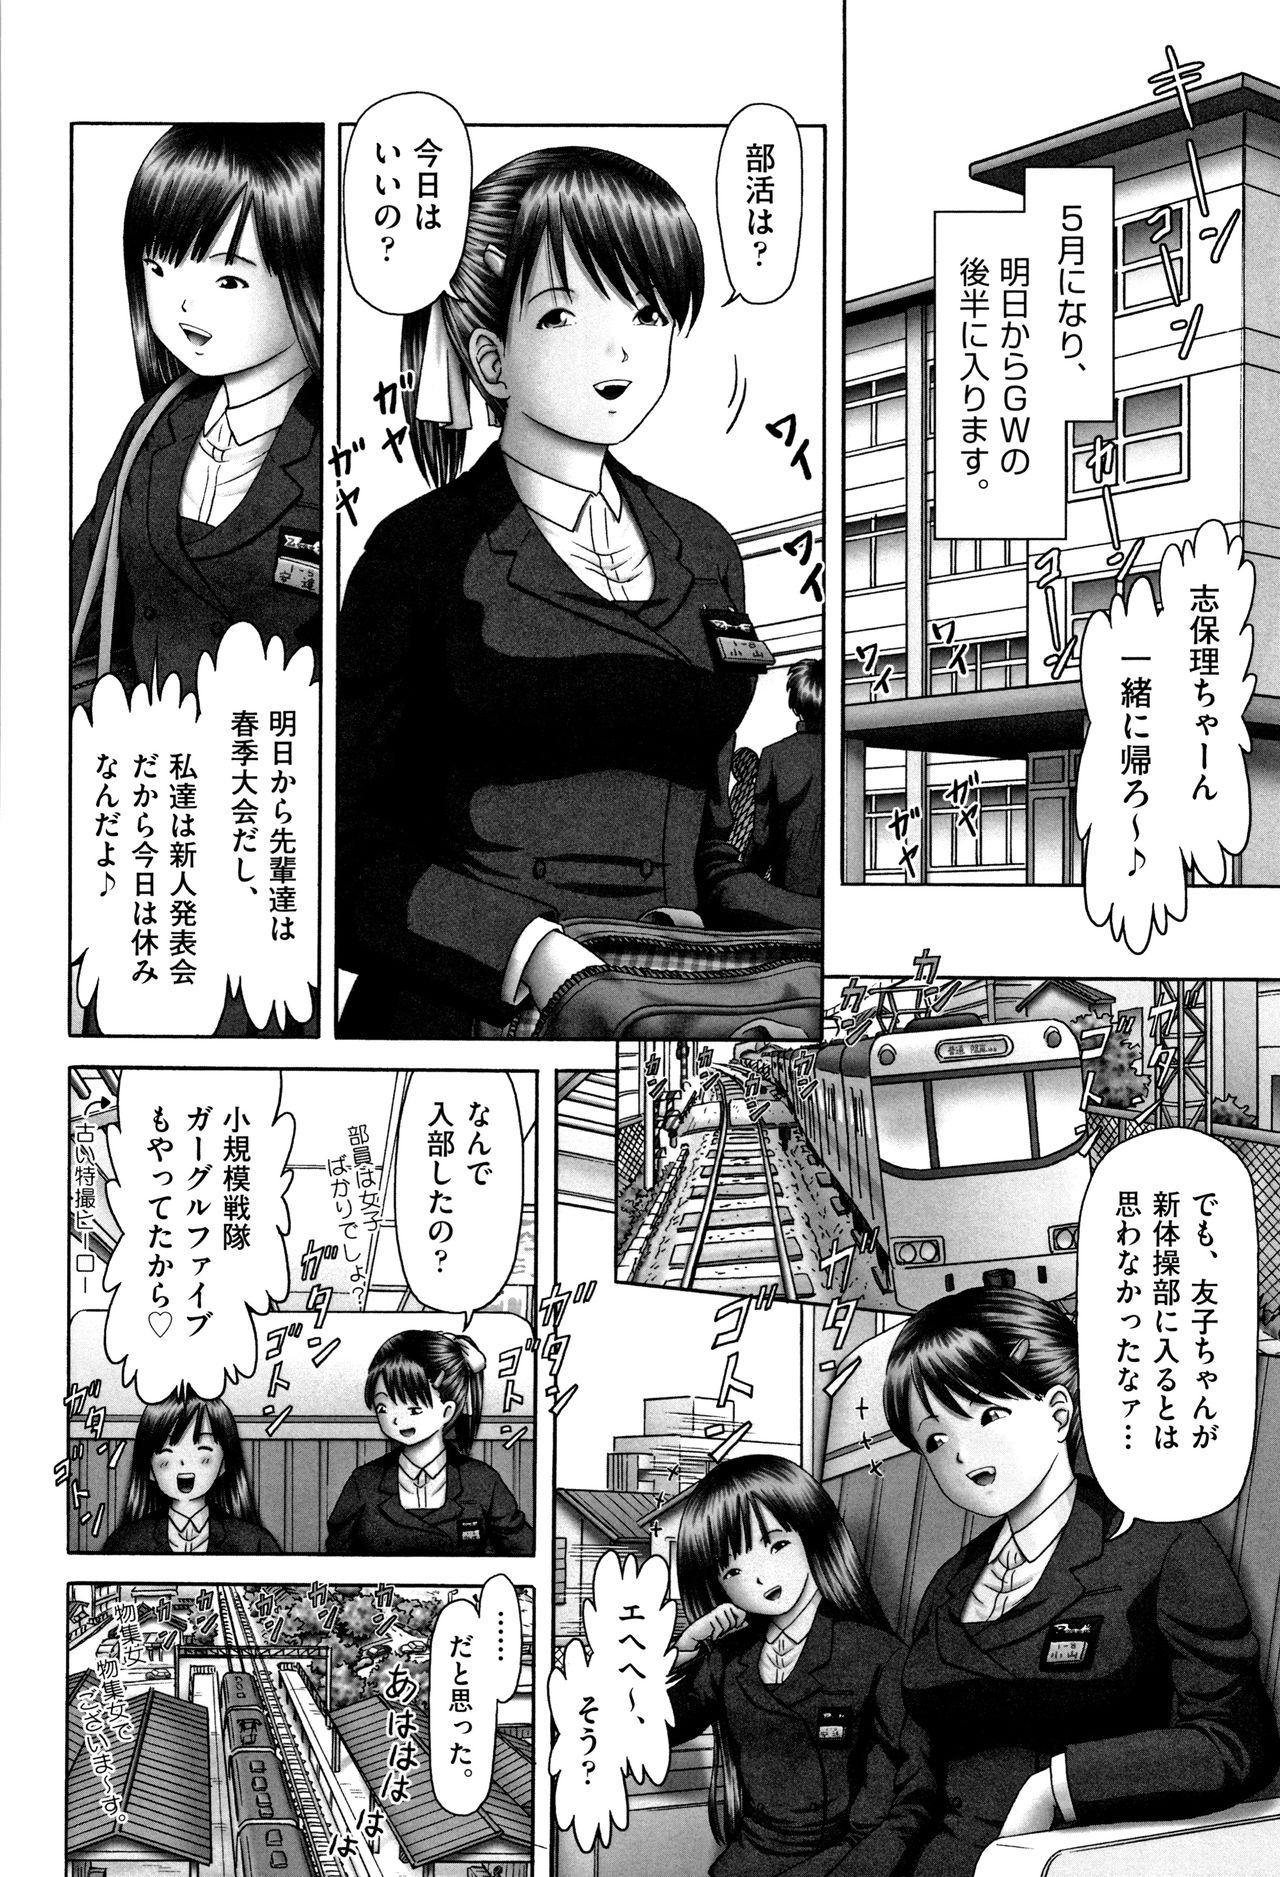 Shoujo Kumikyoku 11 52